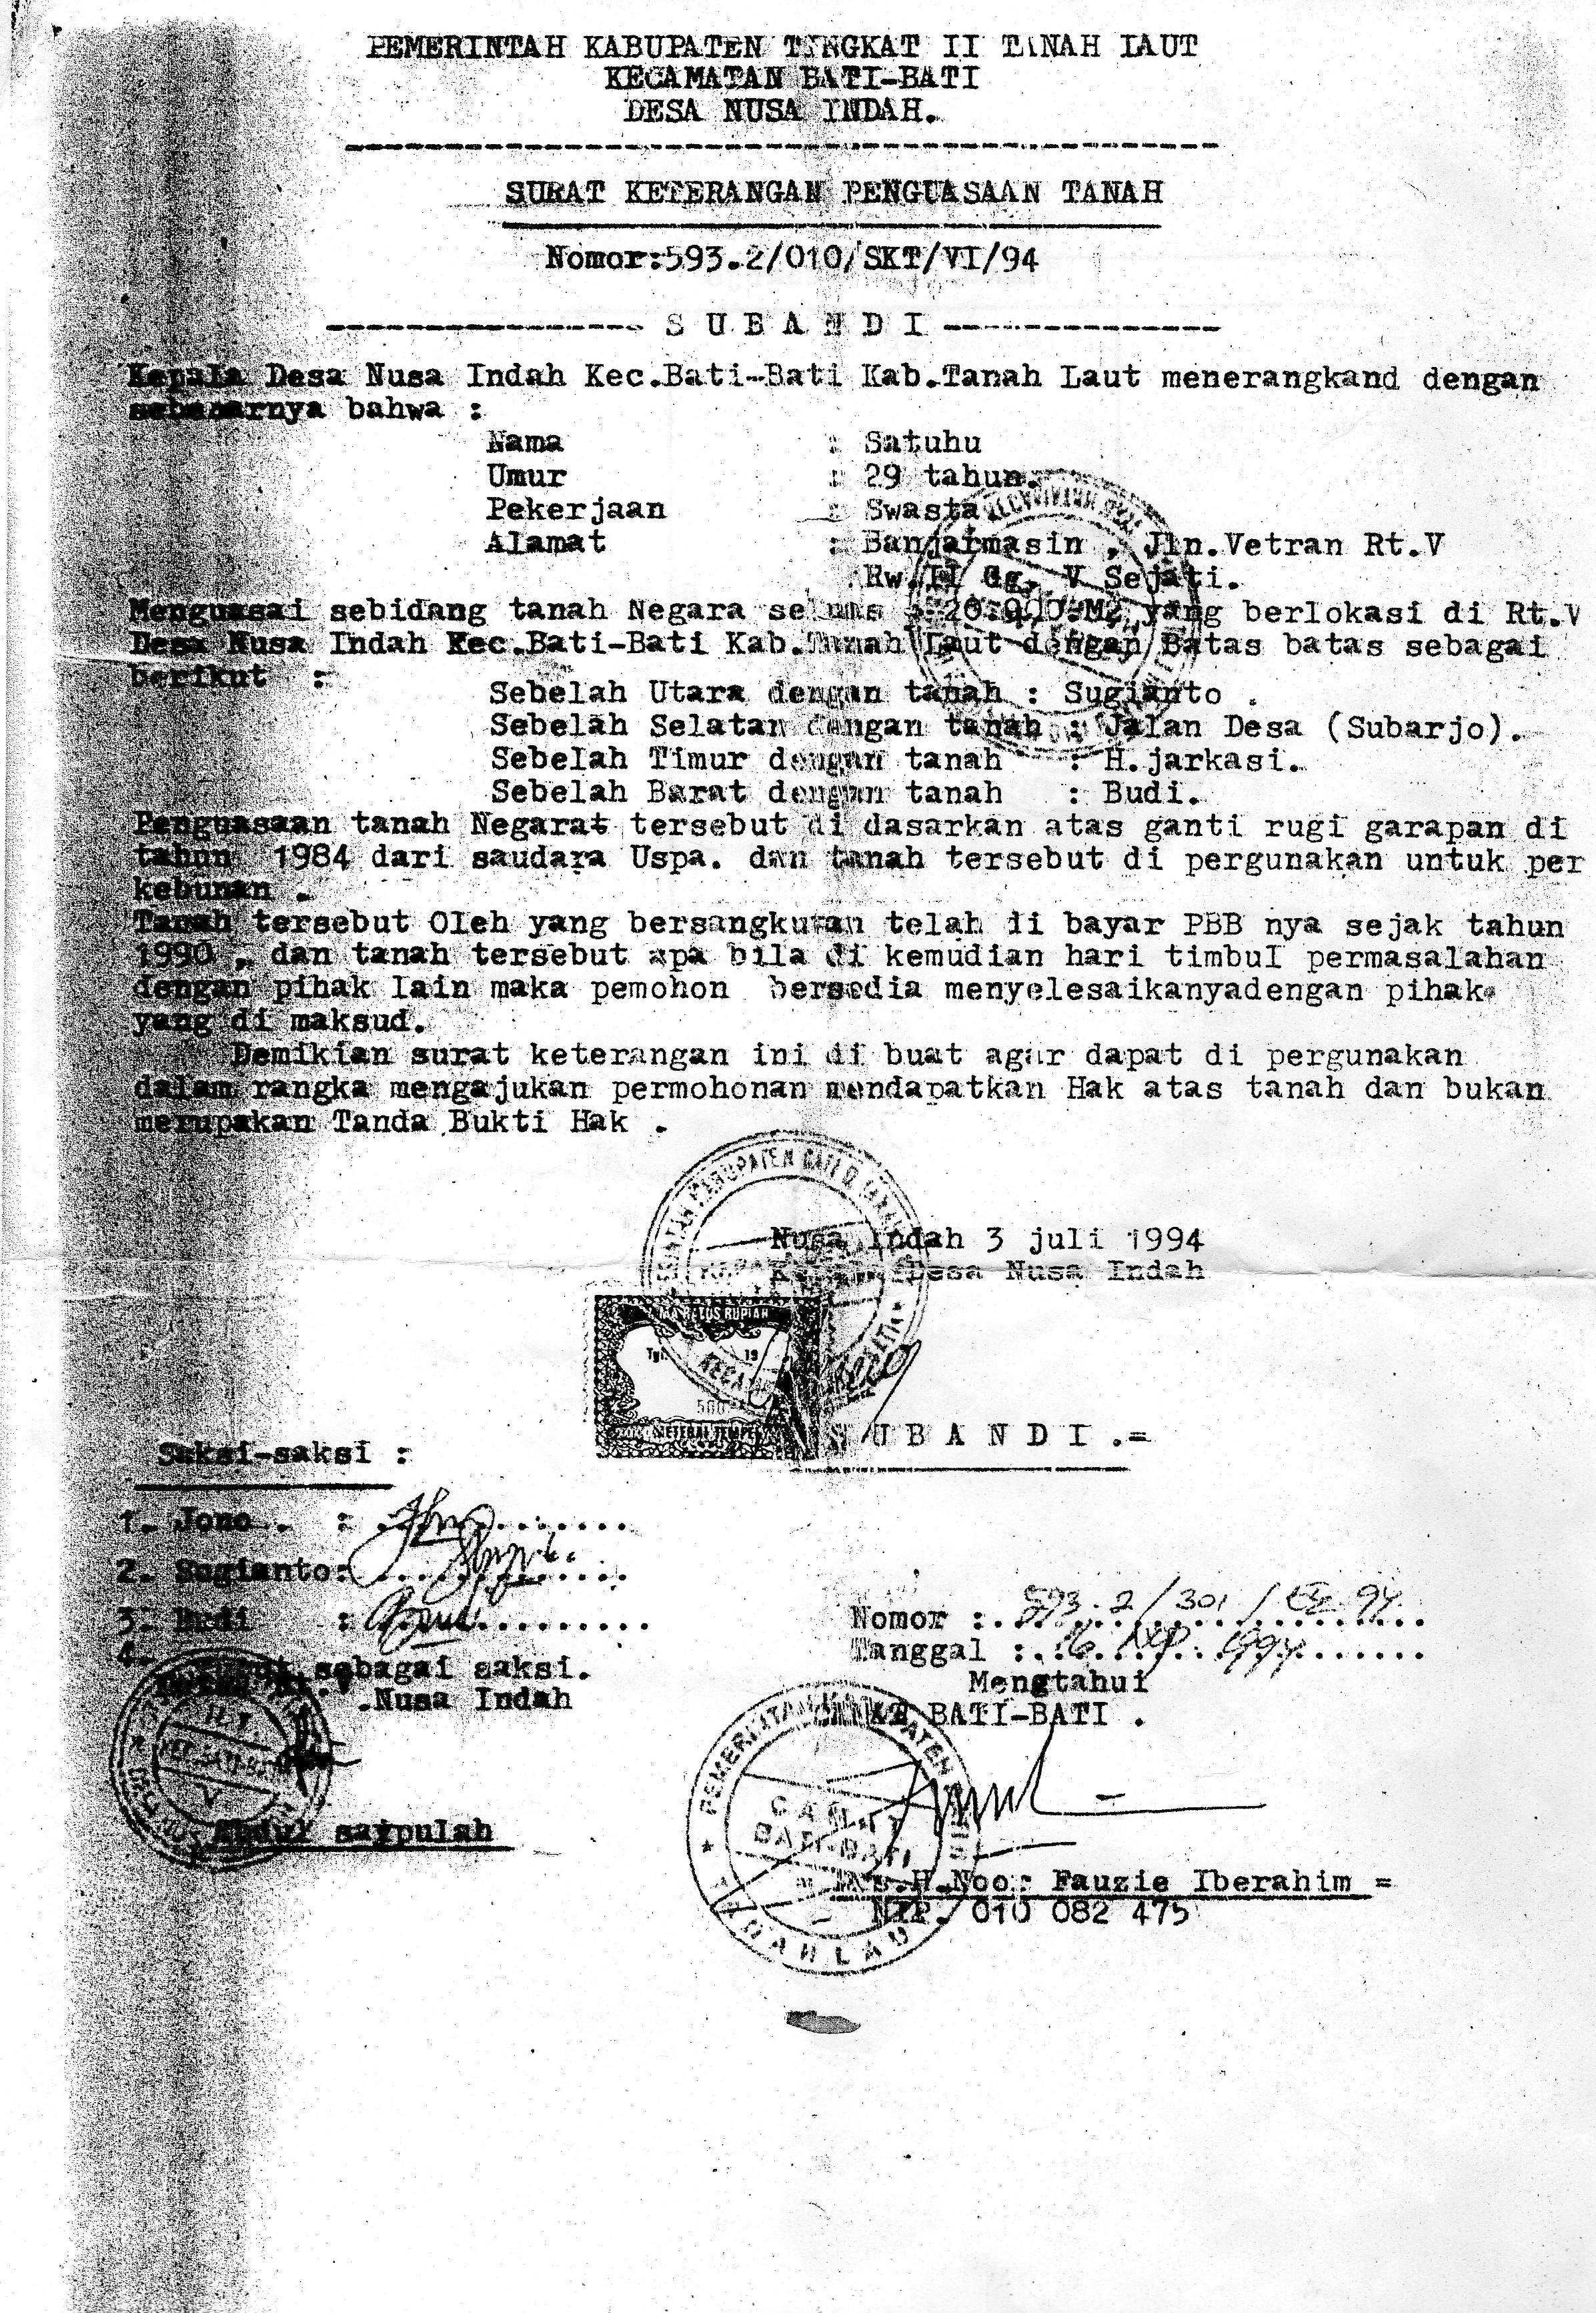 Kompolnas Sertifikat Hak Milik Prona Vs Skpt Halaman All